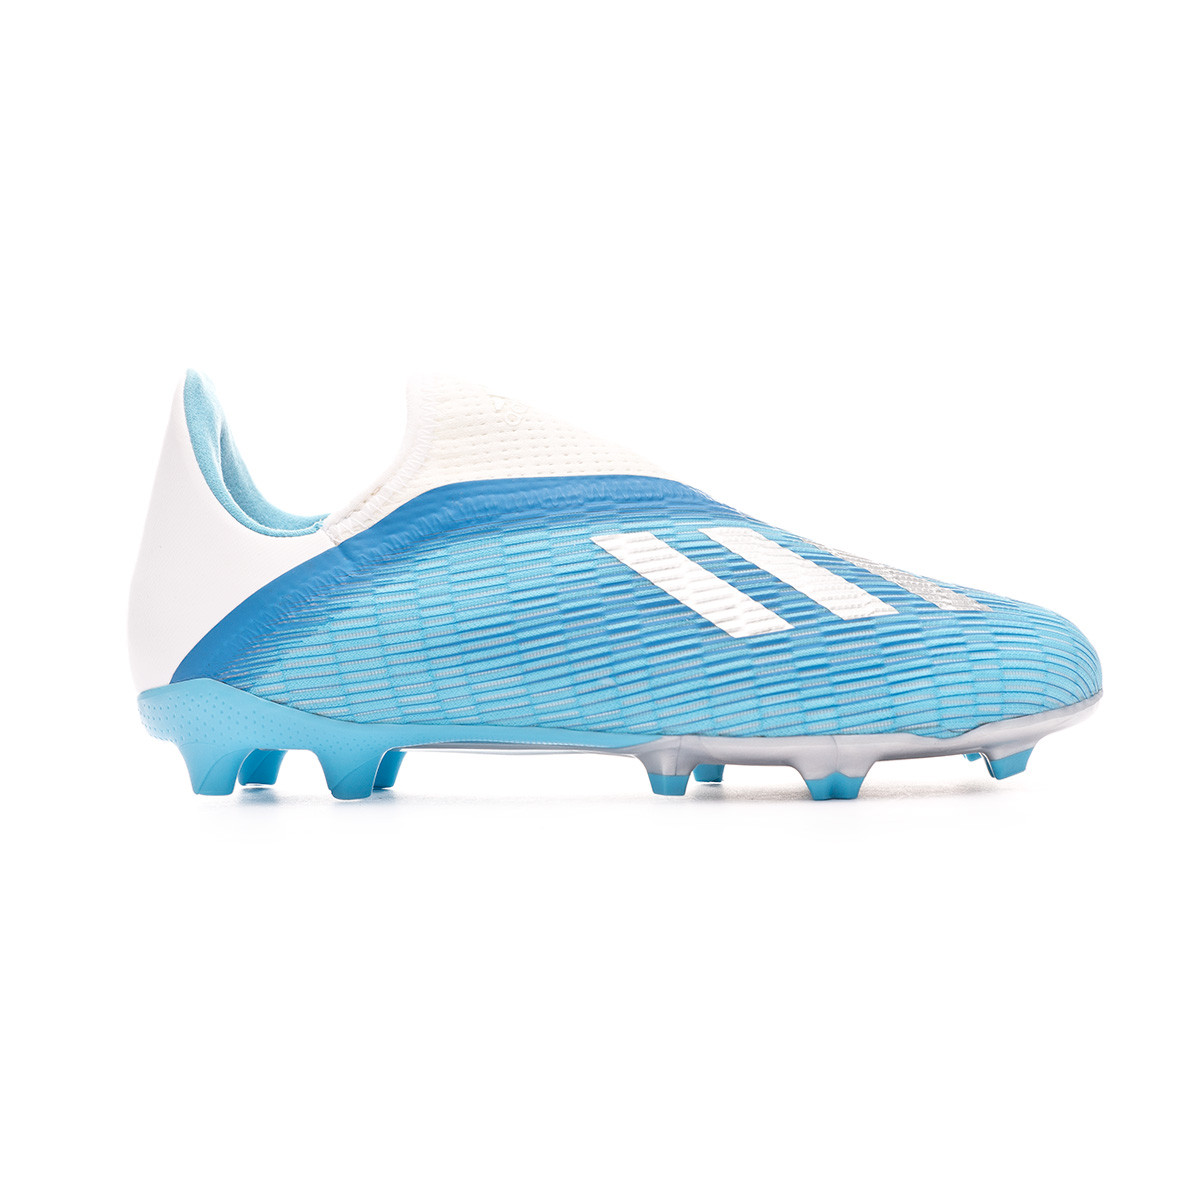 Chaussure de foot adidas X 19.3 LL FG Niño